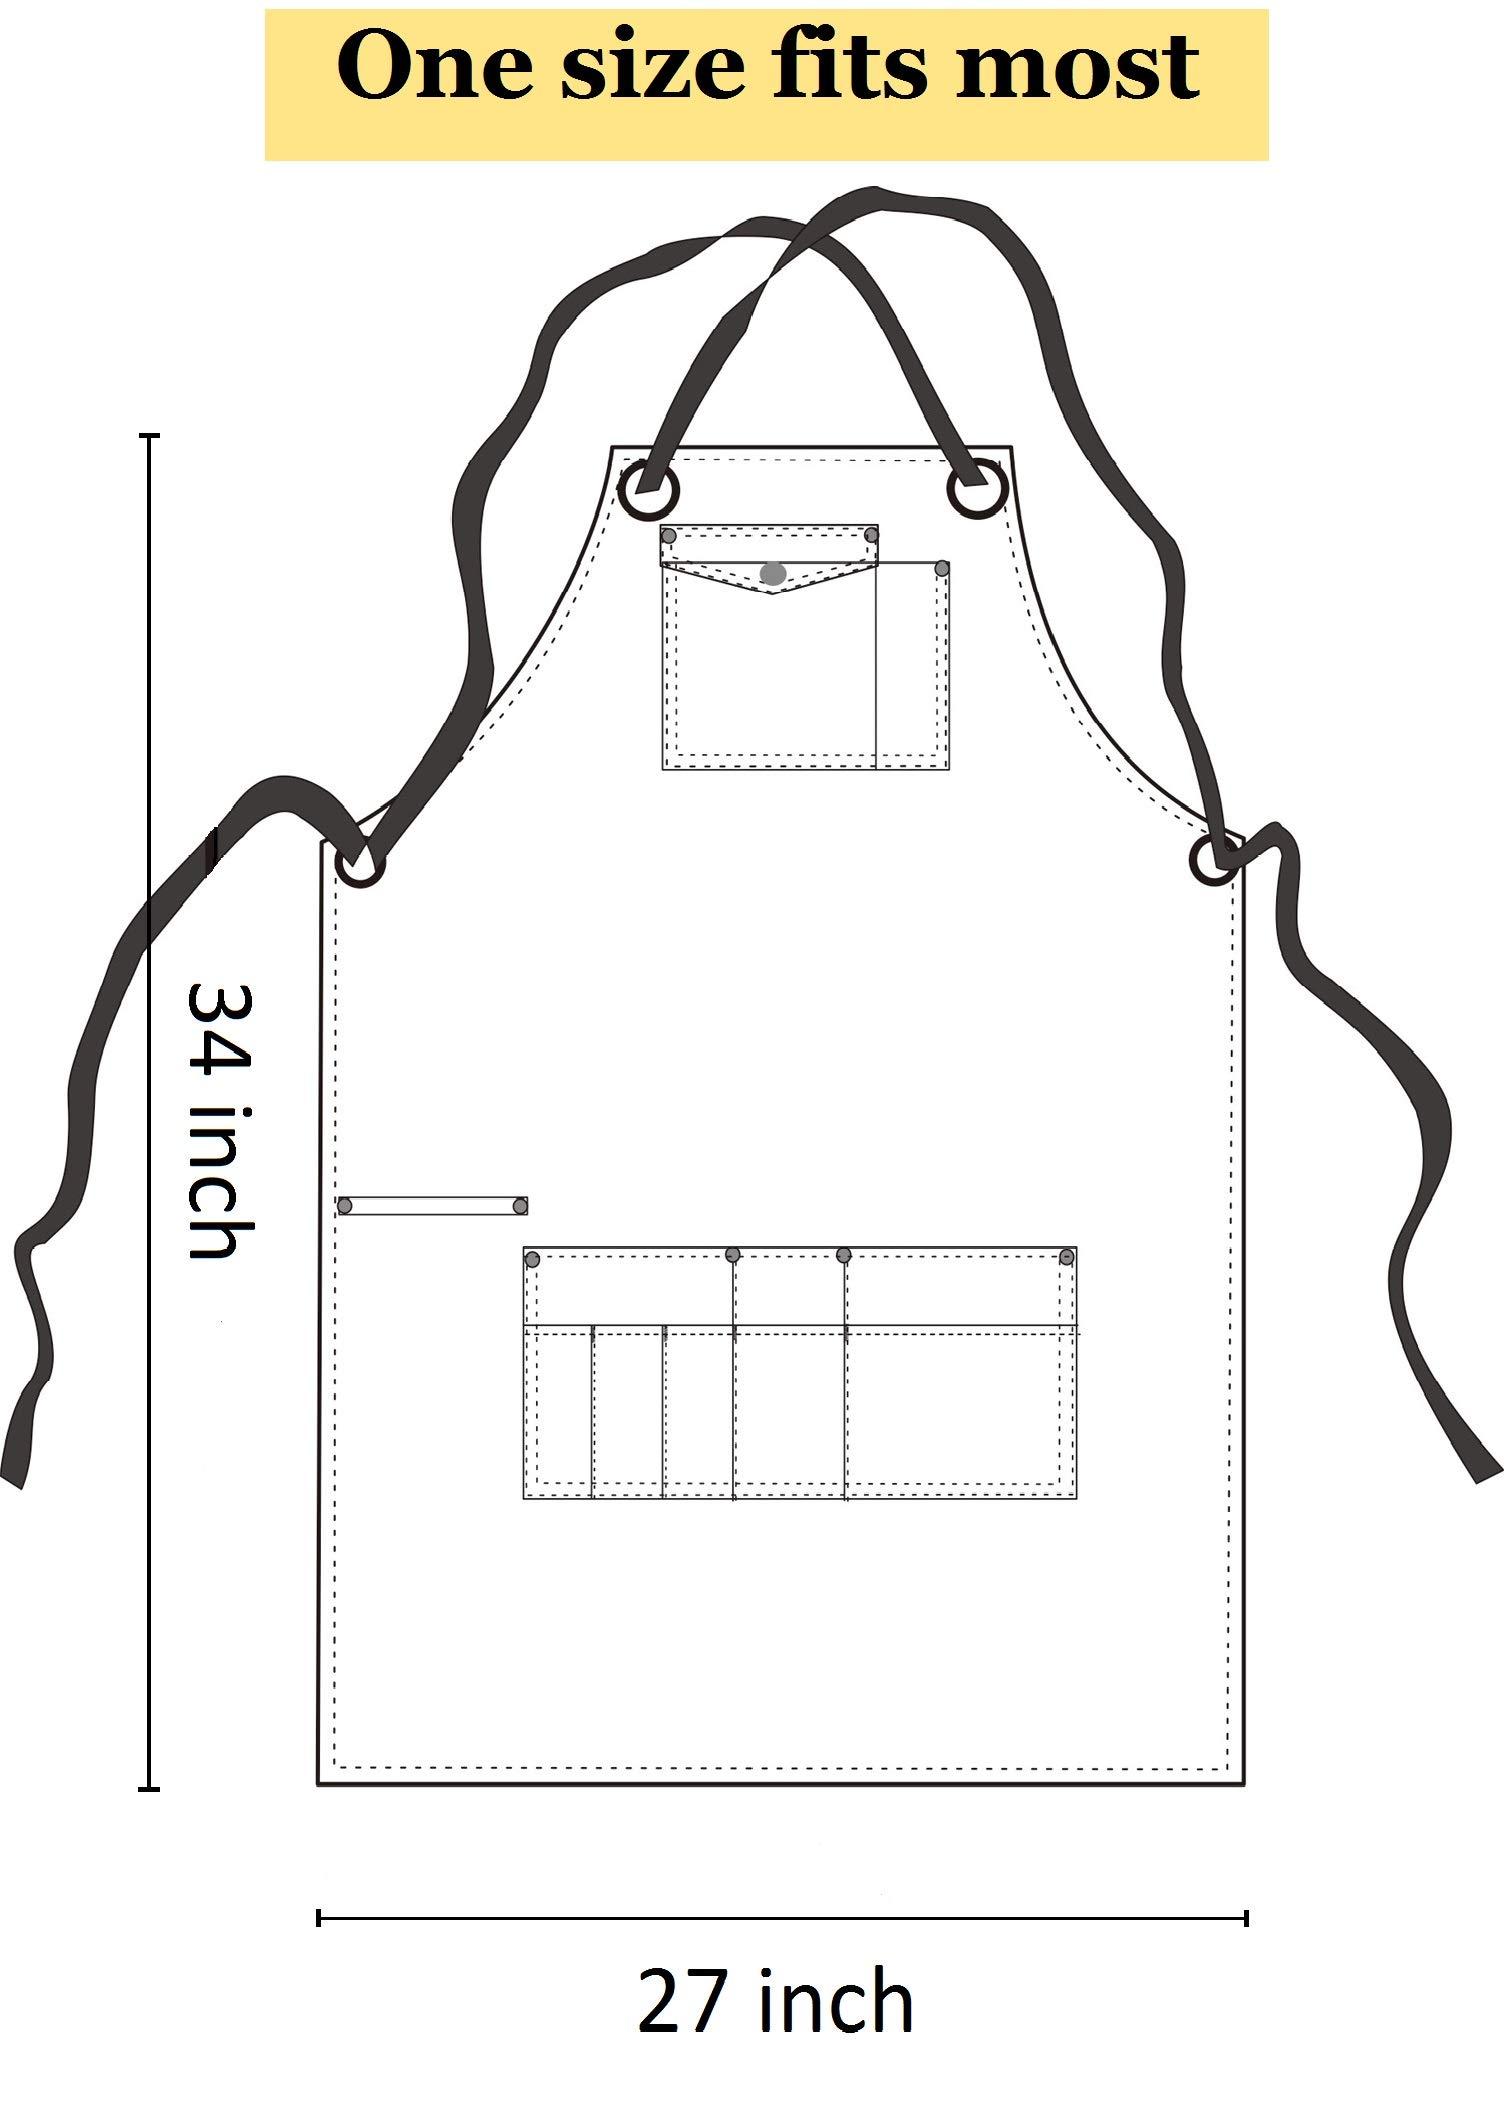 Heavy Duty Denim Jean Shop Work Apron Woodworking Aprons - 10 Tool Pockets | Towel Loop | Cross-back, Adjustable Unisex Utility Bib Apron Fits Men Women, M-XXL by Duo Bao Yu (Image #6)